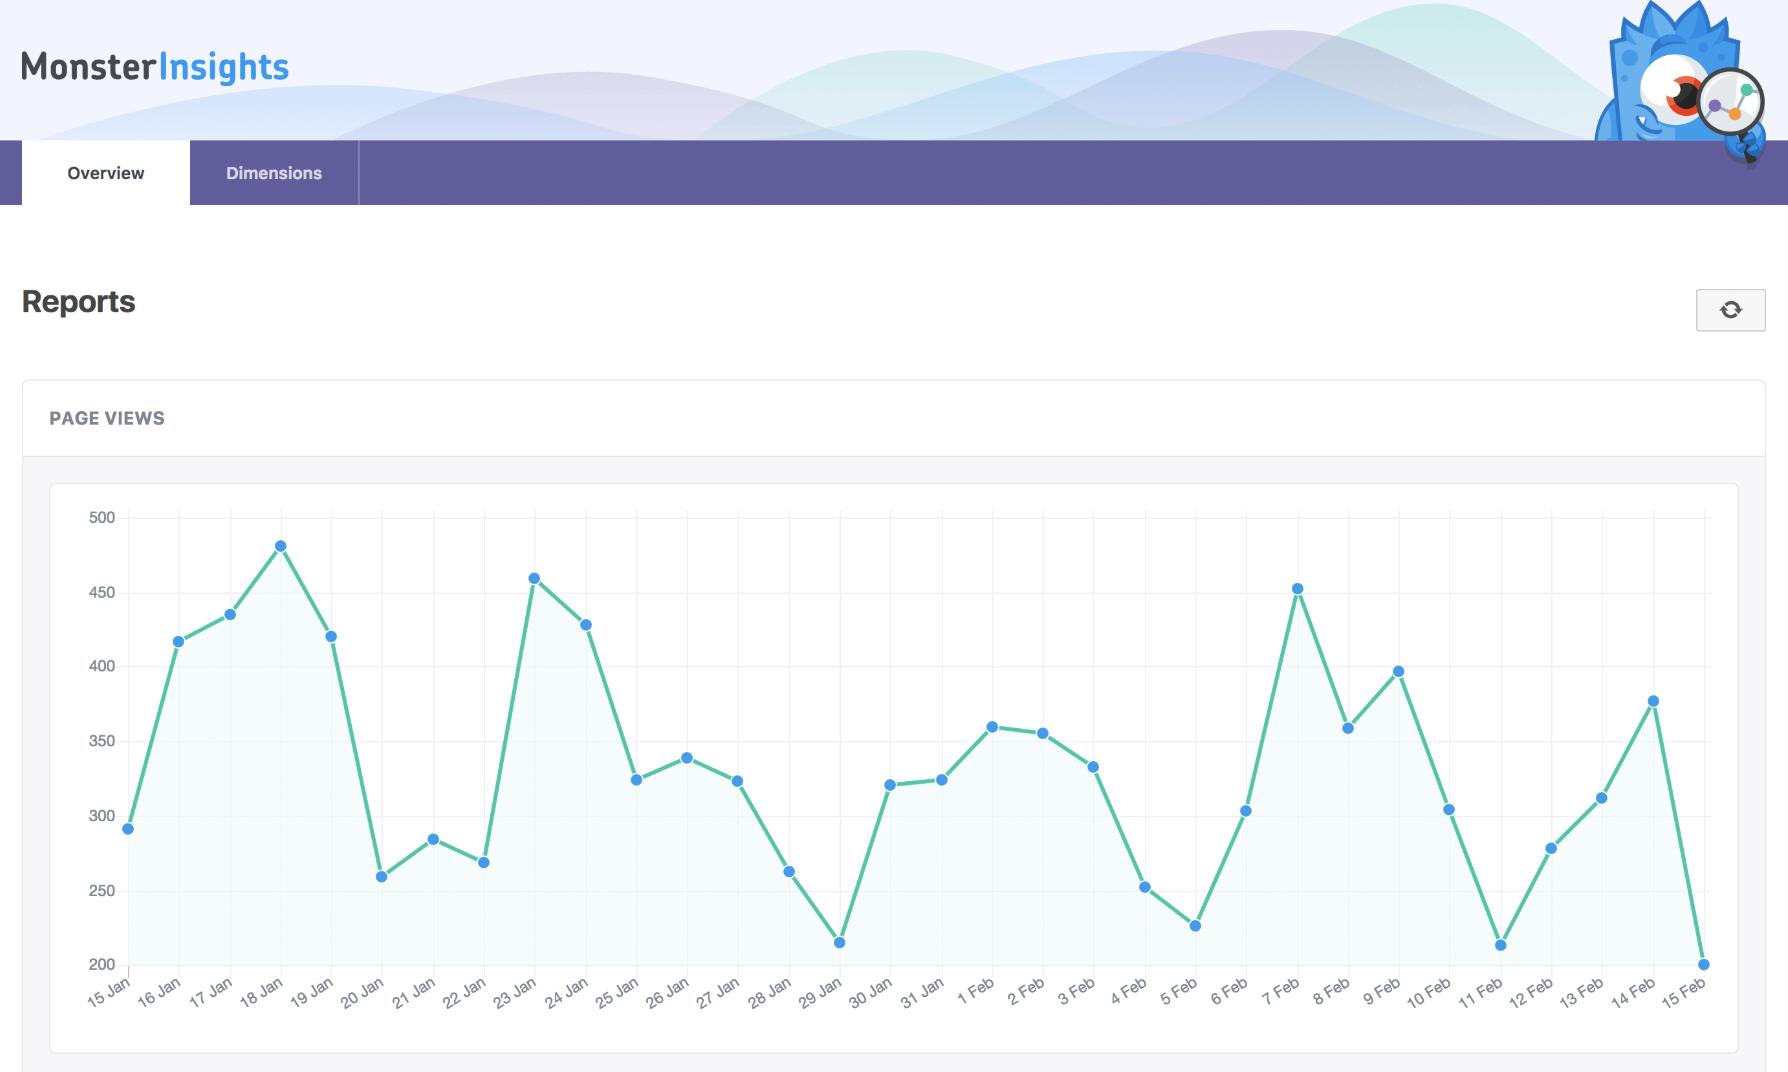 "google-analytics-moster-insights-wordpress-plugin ""srcset ="" https://blog.hubspot.com/hs-fs/hubfs/Screen%20Shot%202018-10-16%20at%203.20.22%20PM.png ? width = 750 & name = Screen% 20Shot% 202018-10-16% 20at% 203.20.22% 20 PM.png 750w, https://blog.hubspot.com/hs-fs/hubfs/Screen%20Shot%202018-10- 16% 20at% 203.20.22% 20 PM.png? Width = 1500 & name = Schermo% 20Shot% 202018-10-16% 20at% 203.20.22% 20 PM.png 1500w, https://blog.hubspot.com/hs-fs /hubfs/Screen%20Shot%202018-10-16%20at%203.20.22%20PM.png?width=2250&name=Screen%20Shot%202018-10-16%20at%203.20.22%20PM.png 2250w, https: //blog.hubspot.com/hs-fs/hubfs/Screen%20Shot%202018-10-16%20at%203.20.22%20PM.png?width=3000&name=Screen%20Shot%202018-10-16%20at% 203.20.22% 20 PM.png 3000w, https://blog.hubspot.com/hs-fs/hubfs/Screen%20Shot%202018-10-16%20at%203.20.22%20PM.png?width=3750&name=Screen % 20Shot% 202018-10-16% 20at% 203.20.22% 20 PM.png 3750w, https://blog.hubspot.com/hs-fs/hubfs/Screen%20Shot%202018-10-16%20at%203.20. 22% 20 PM.png? width = 4500 & name = schermo% 20Shot% 202018-10-16% 20 a% 203.20.22% 20 PM.png 4500w ""sizes ="" (larghezza massima: 1500px) 100vw, 1500px"